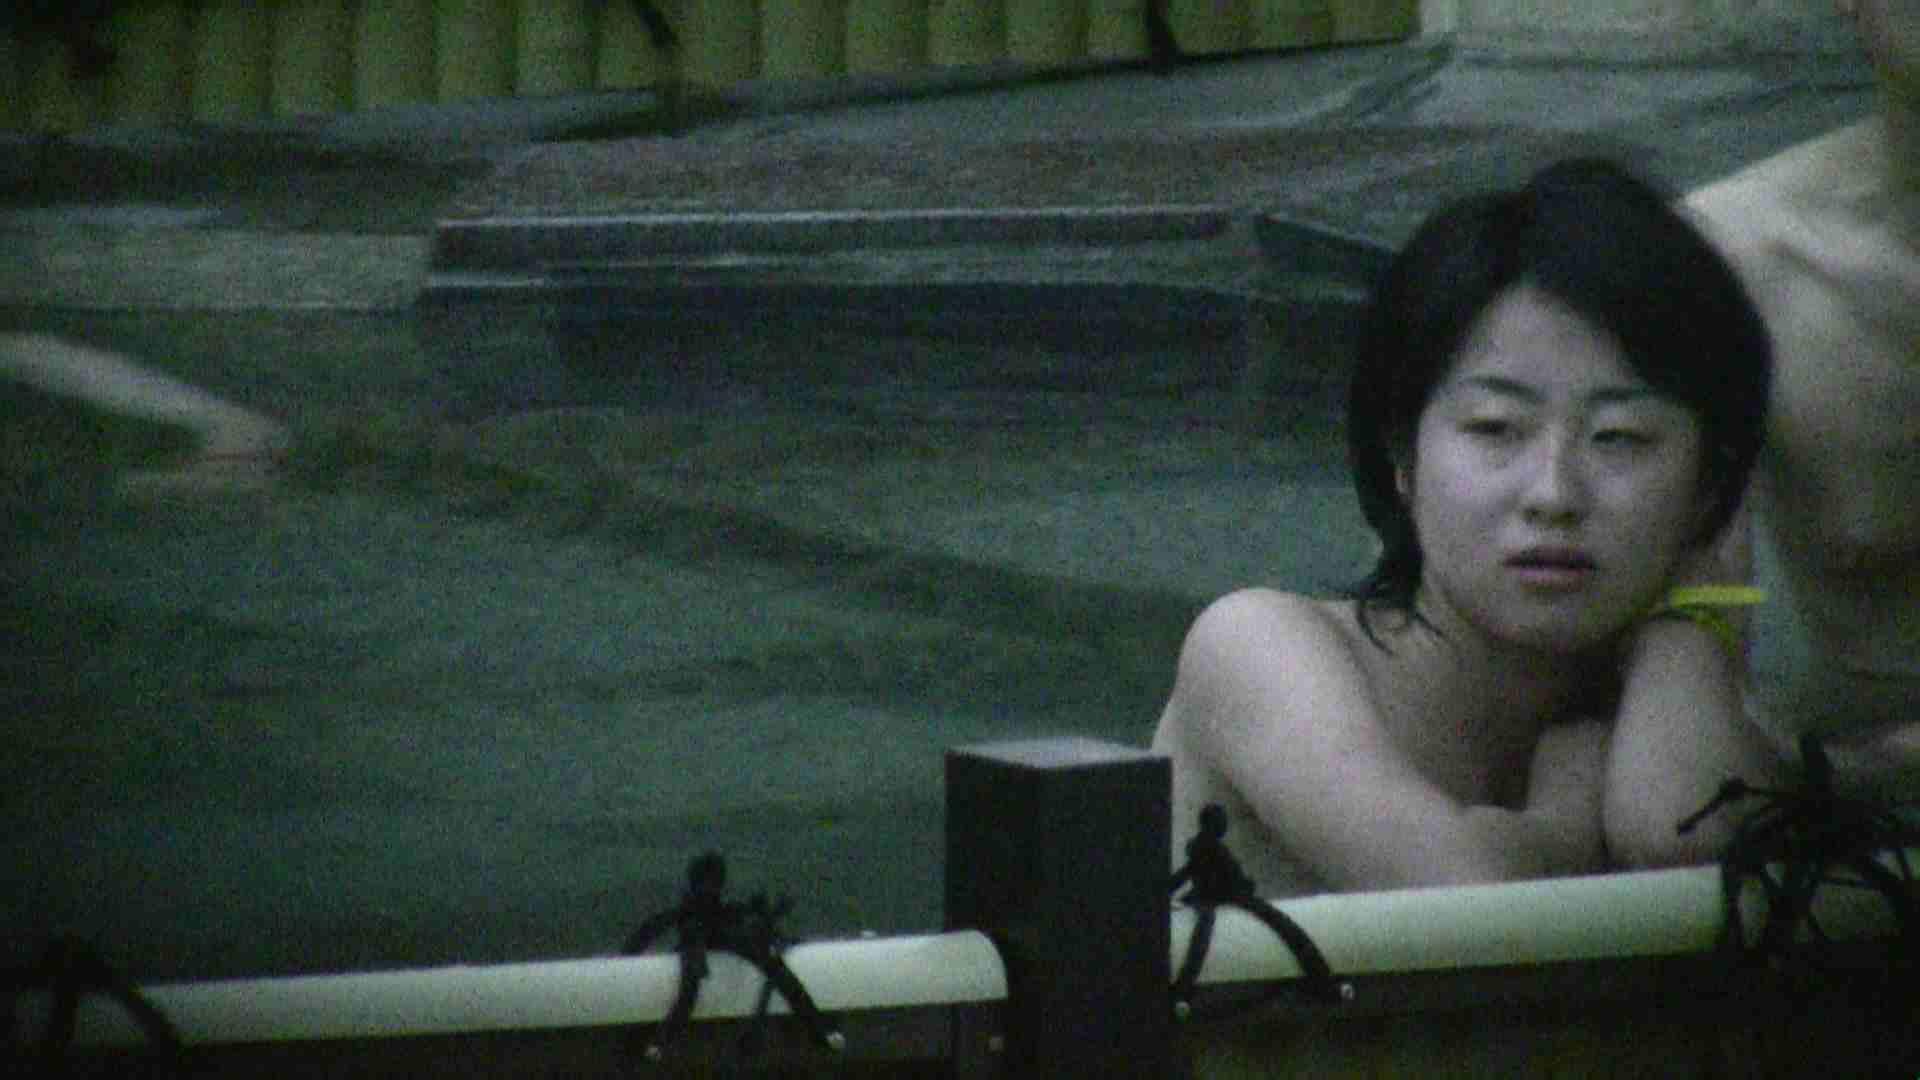 Aquaな露天風呂Vol.112 0  68連発 44